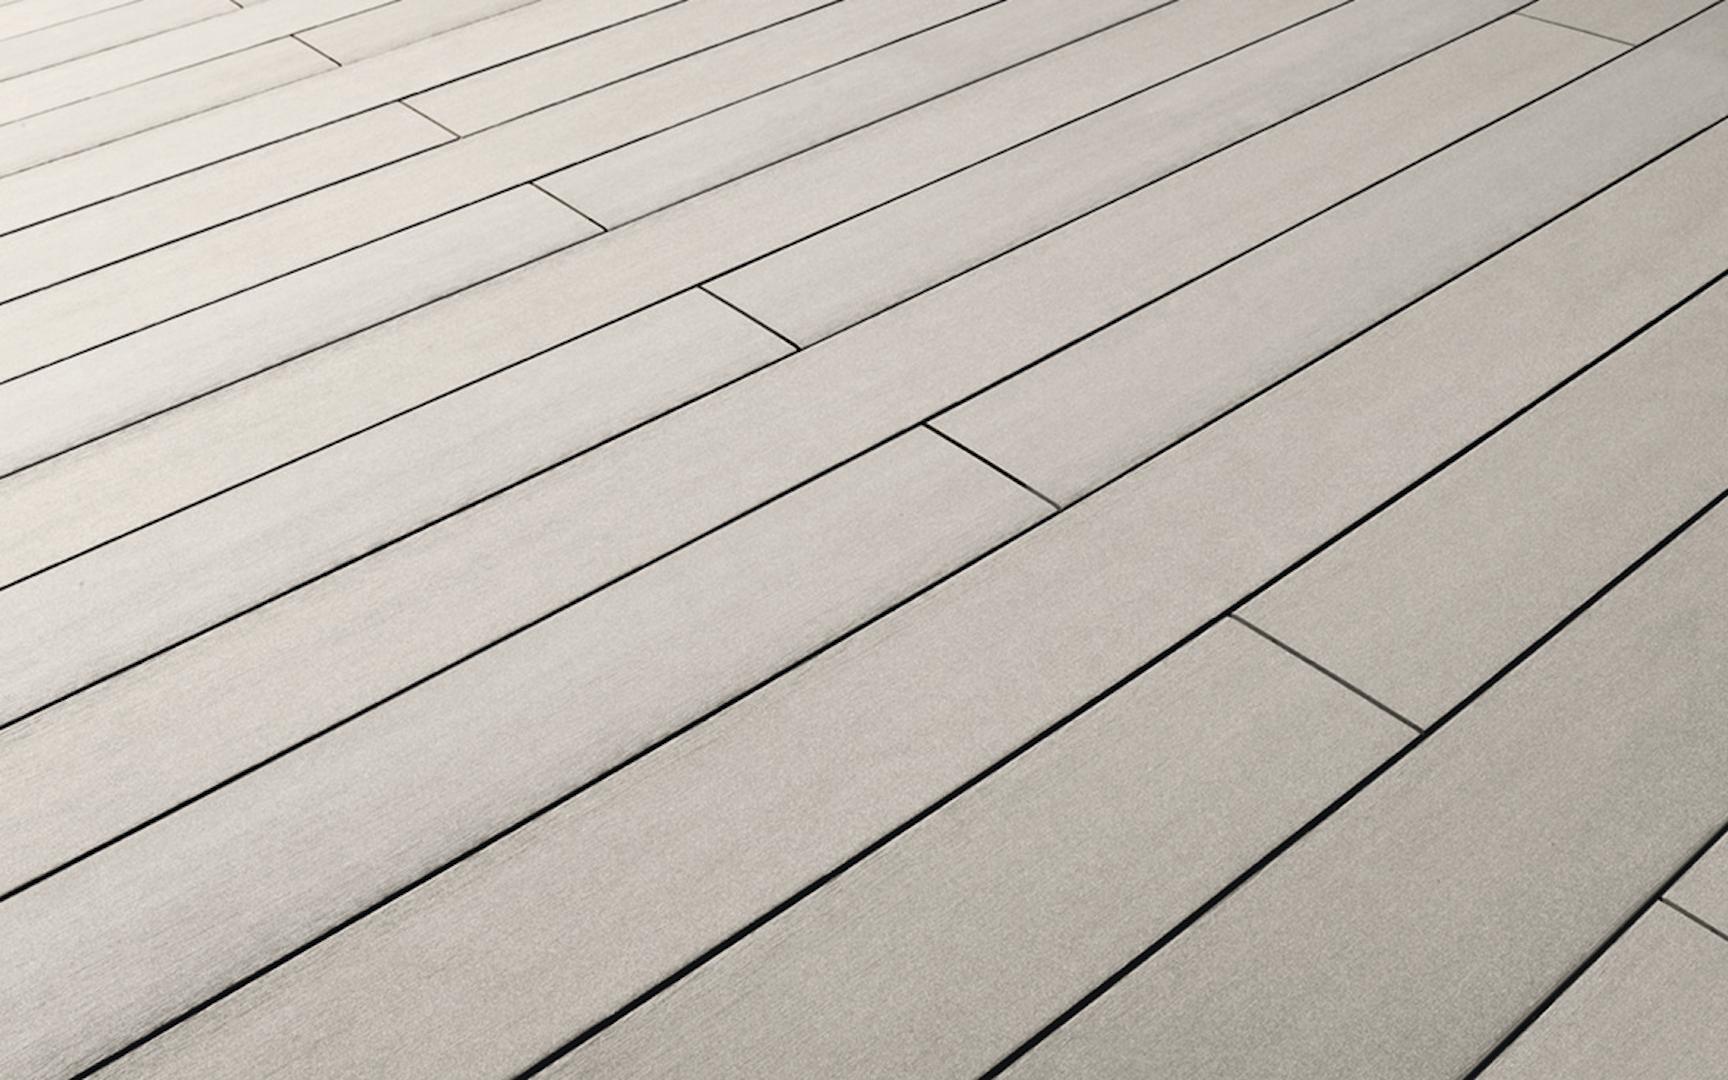 terrafina-composite-decking-plain-pebblegrey-surface-finish